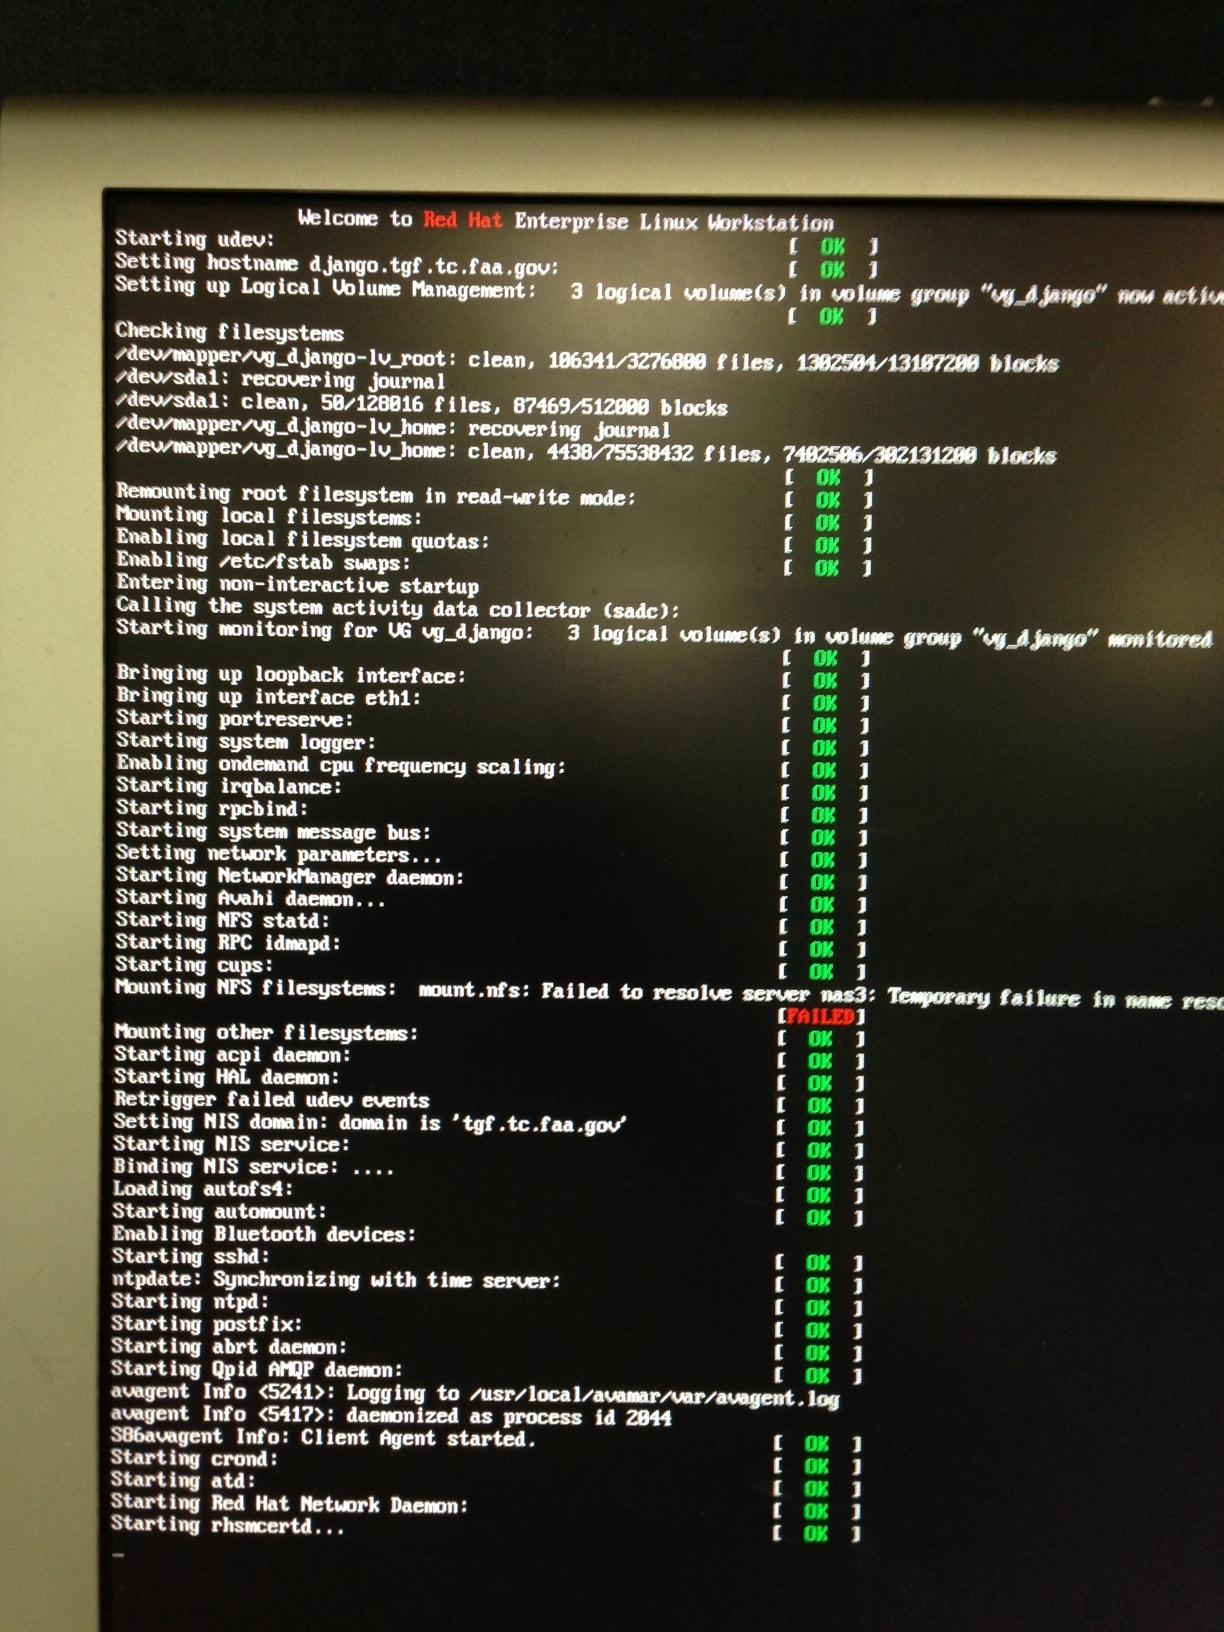 Boot hangs after starting 'rhsmcertd' service - Red Hat Customer Portal